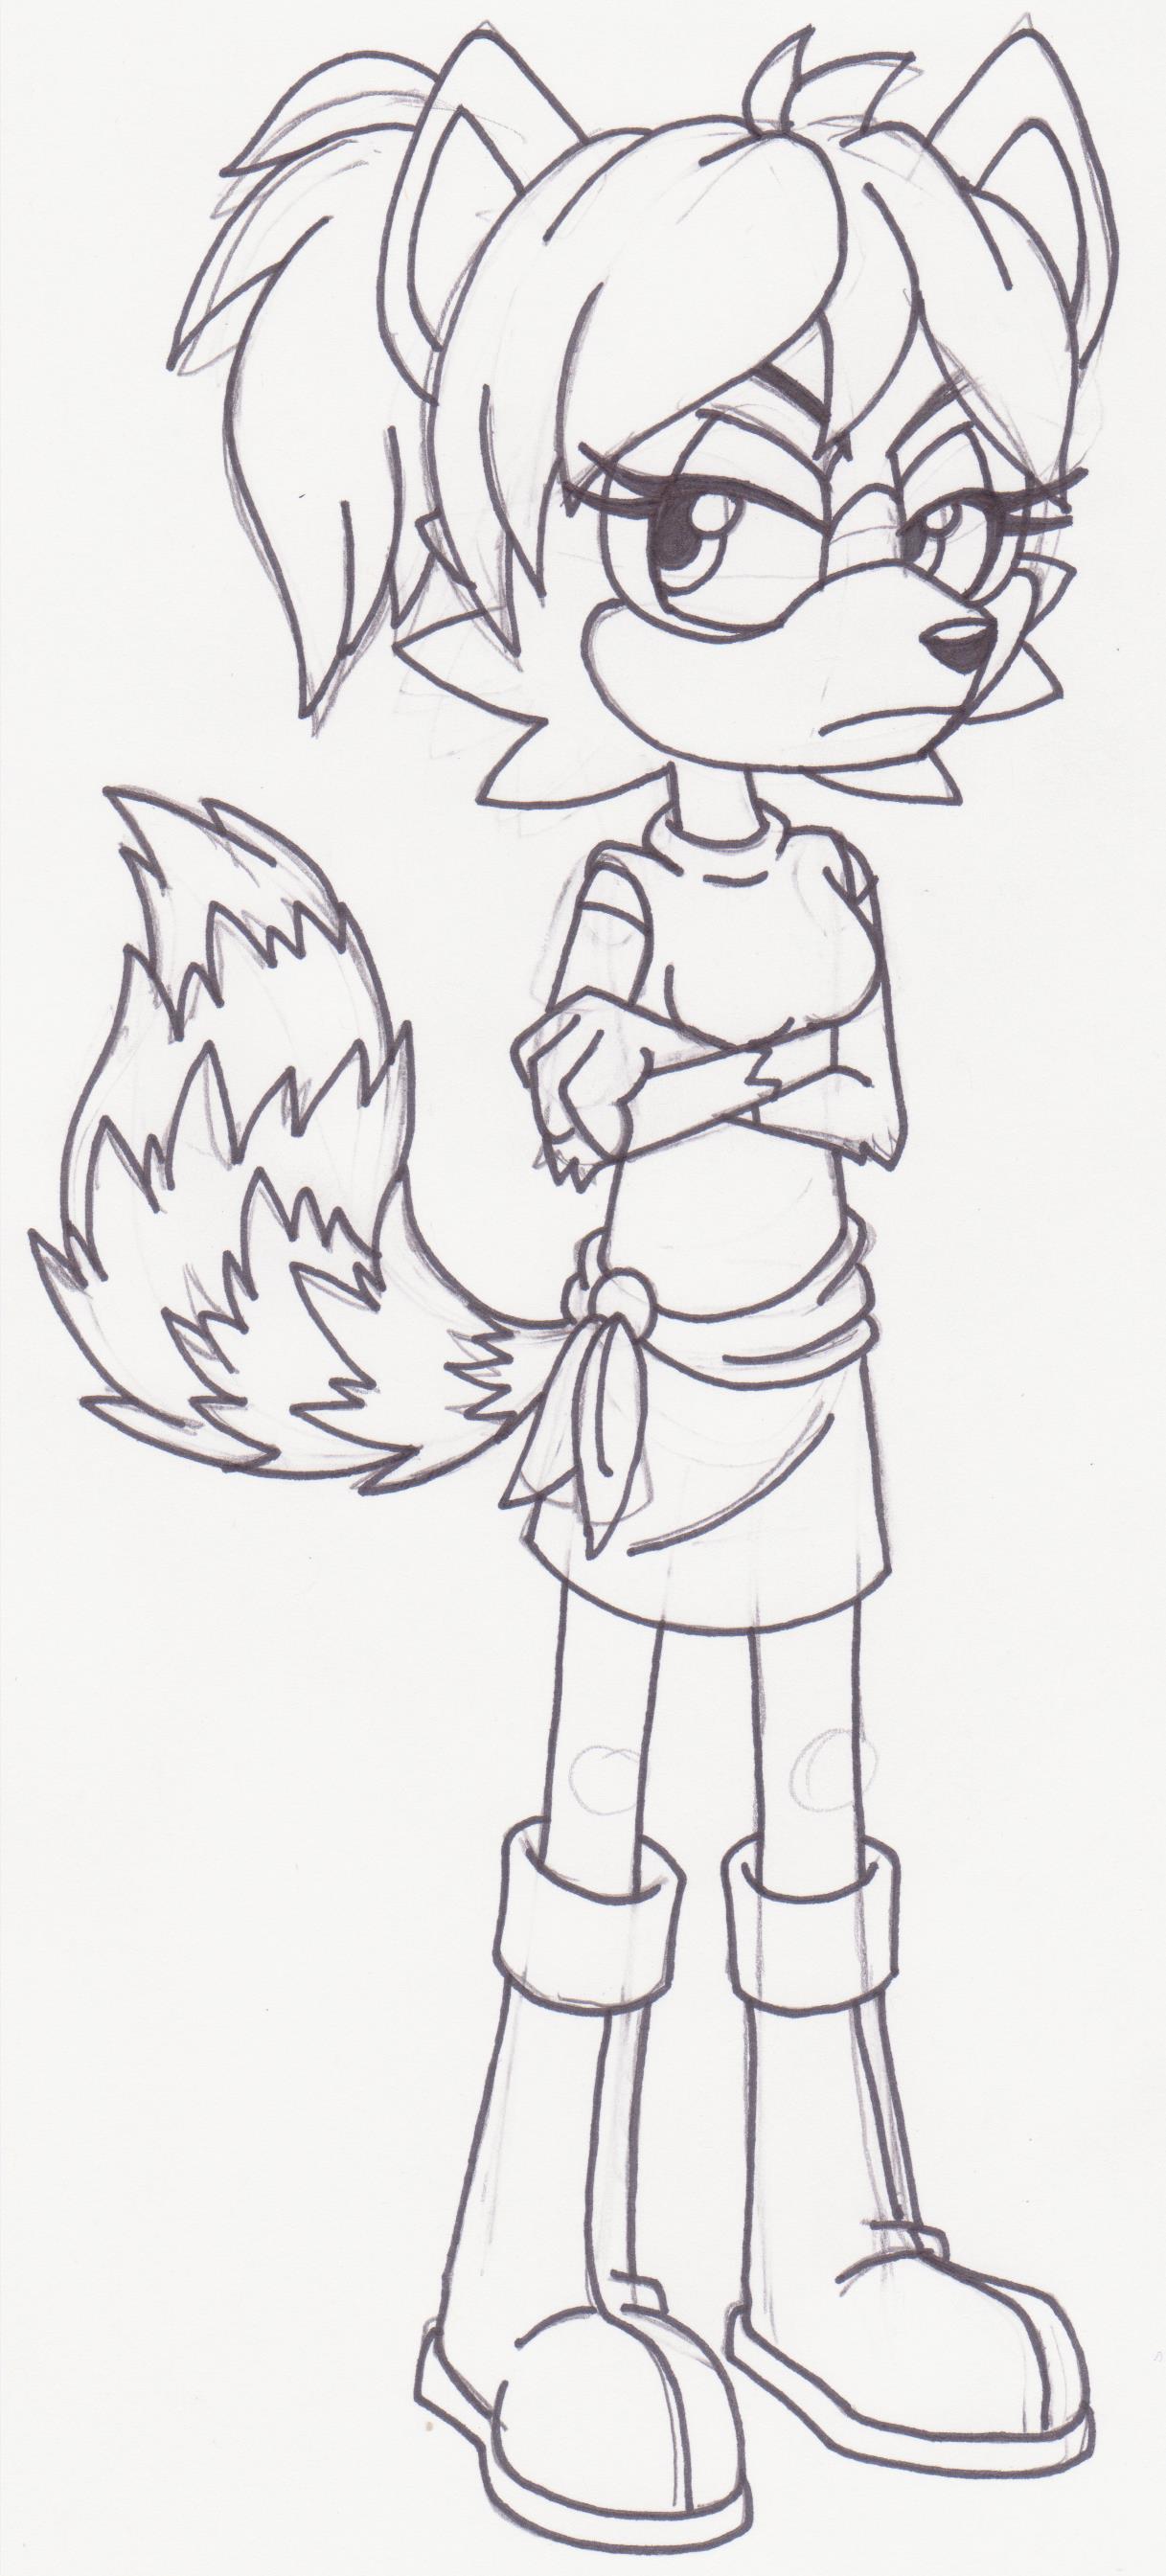 Regina the Raccoon